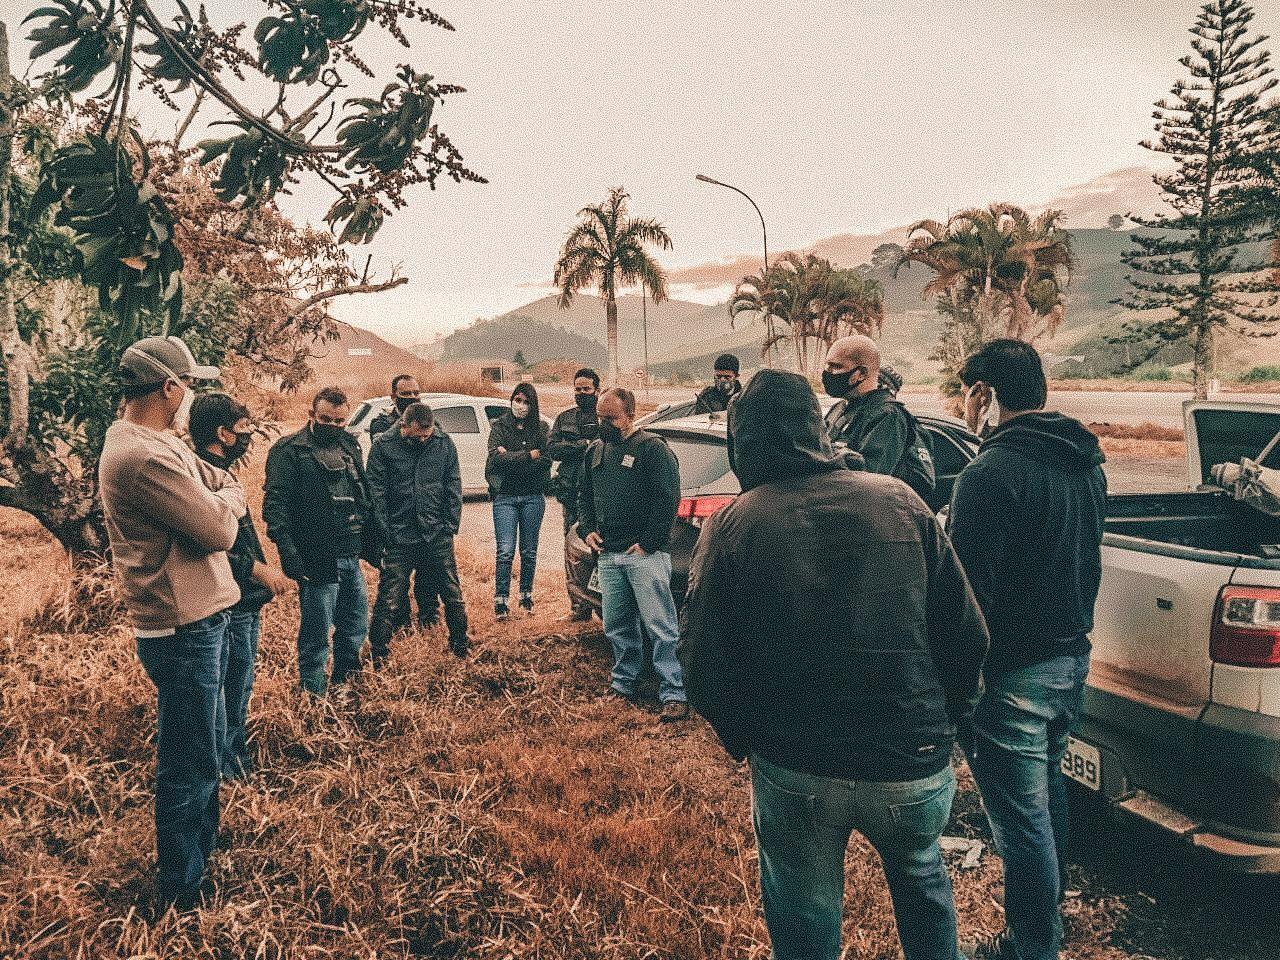 Polícia Civil desmantela quadrilha suspeita de furto de gado na Zona da Mata